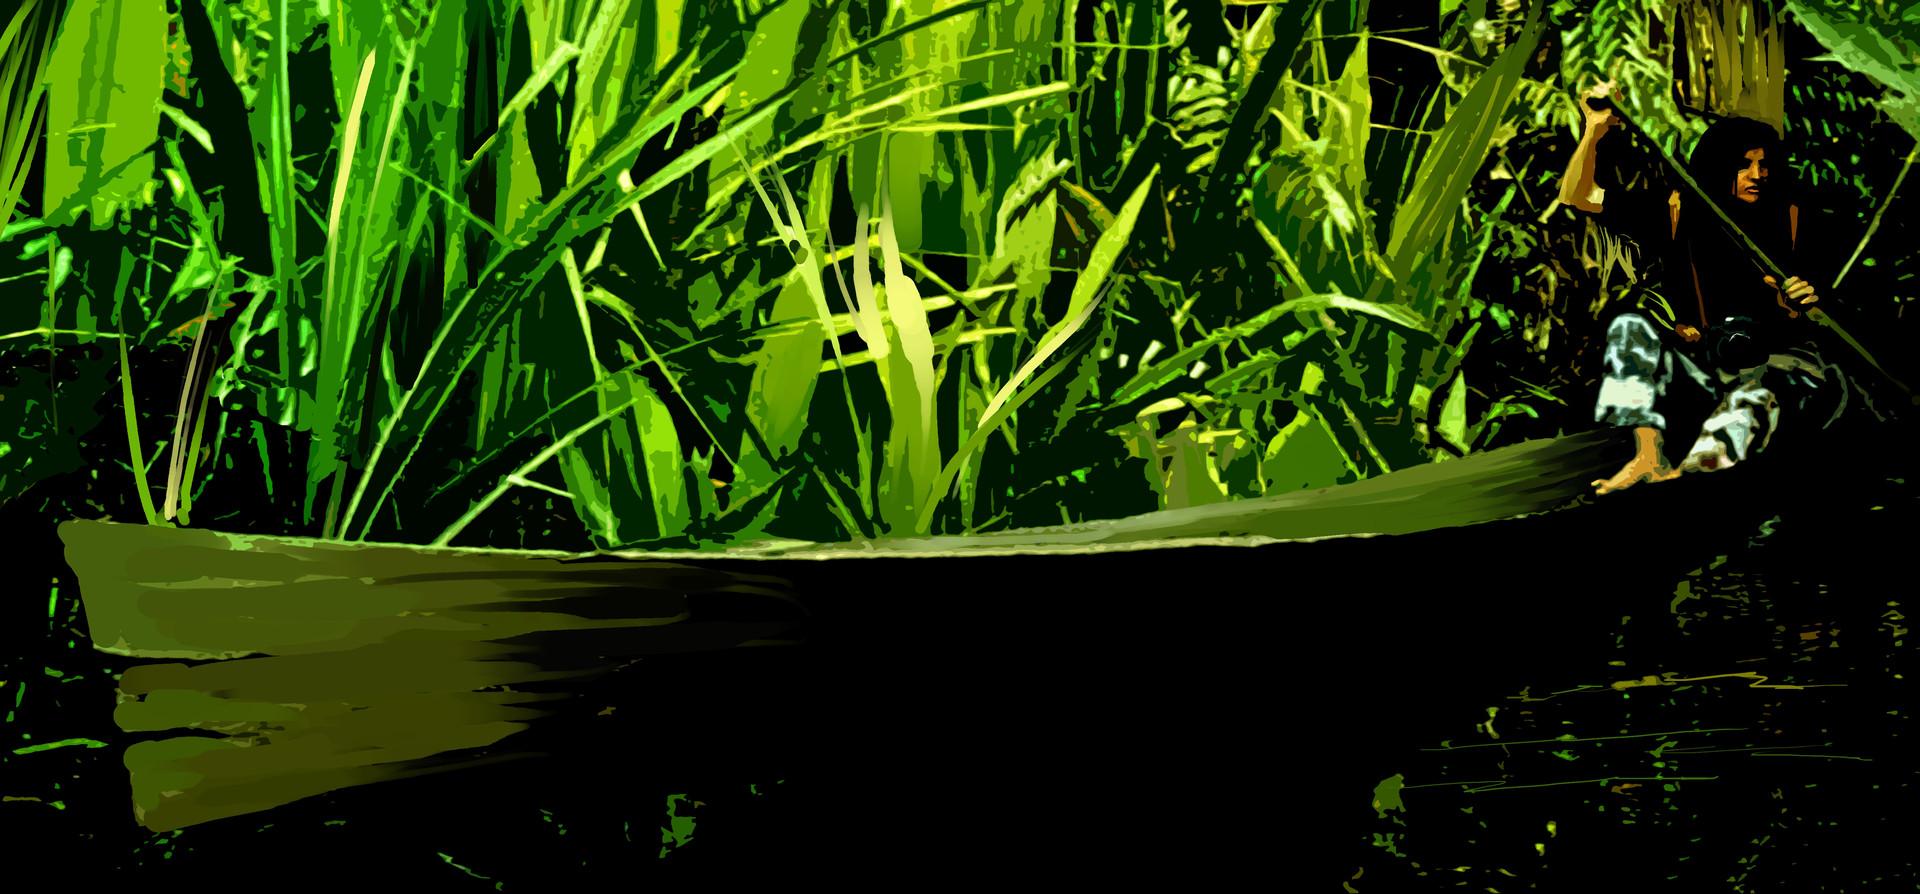 Midhat kapetanovic 06a swamp ride